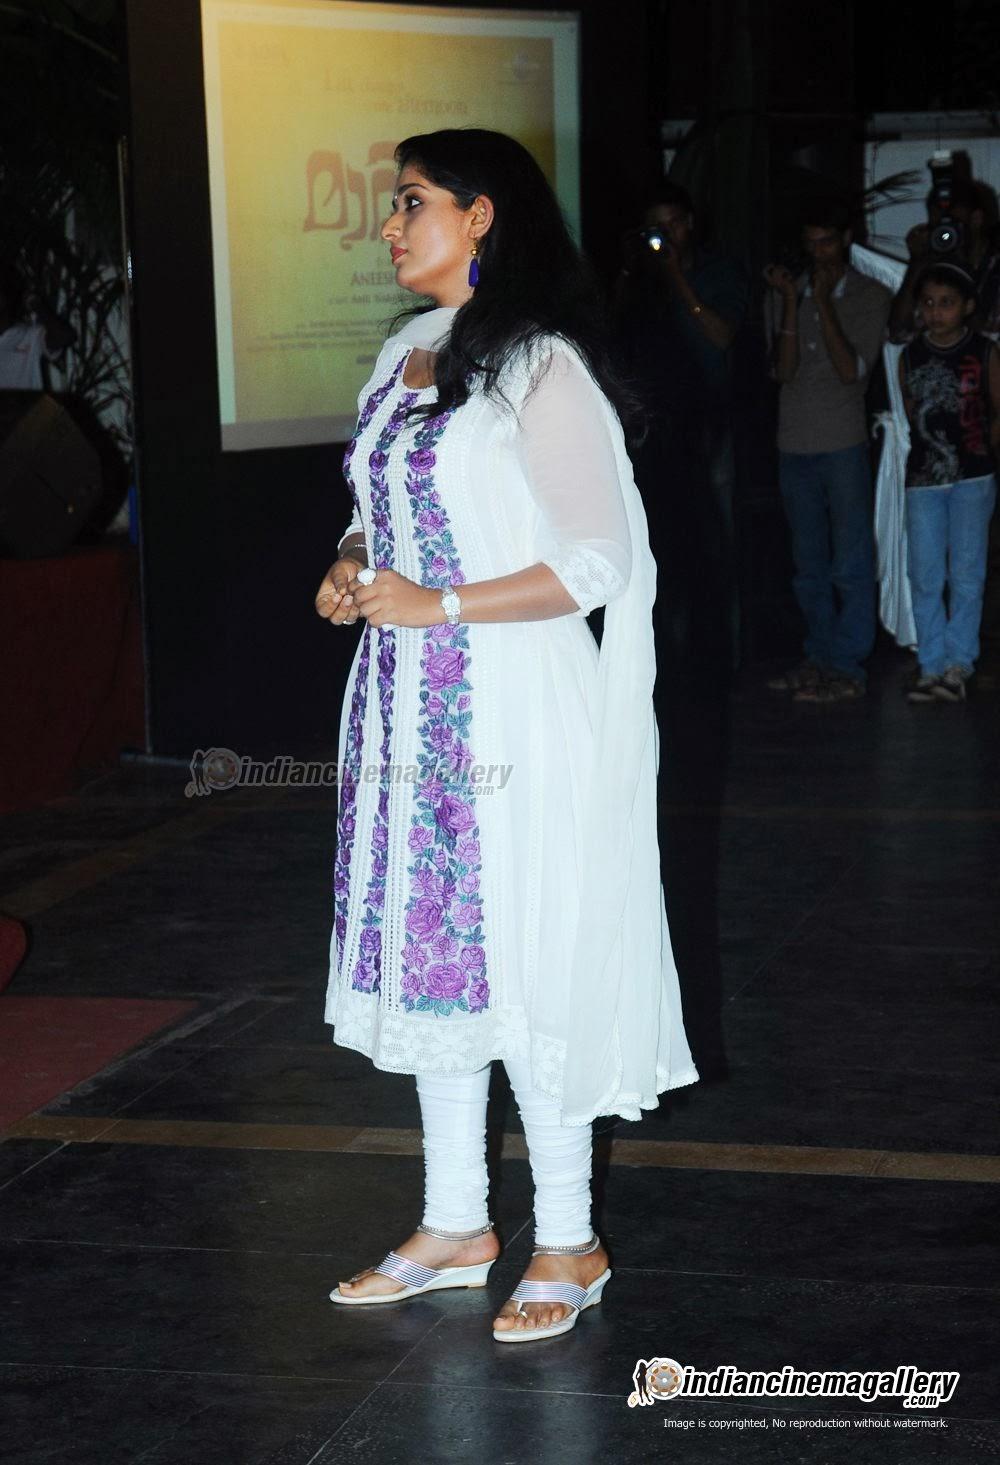 MALAYALAM ACTRESS: Kavya Madhavan